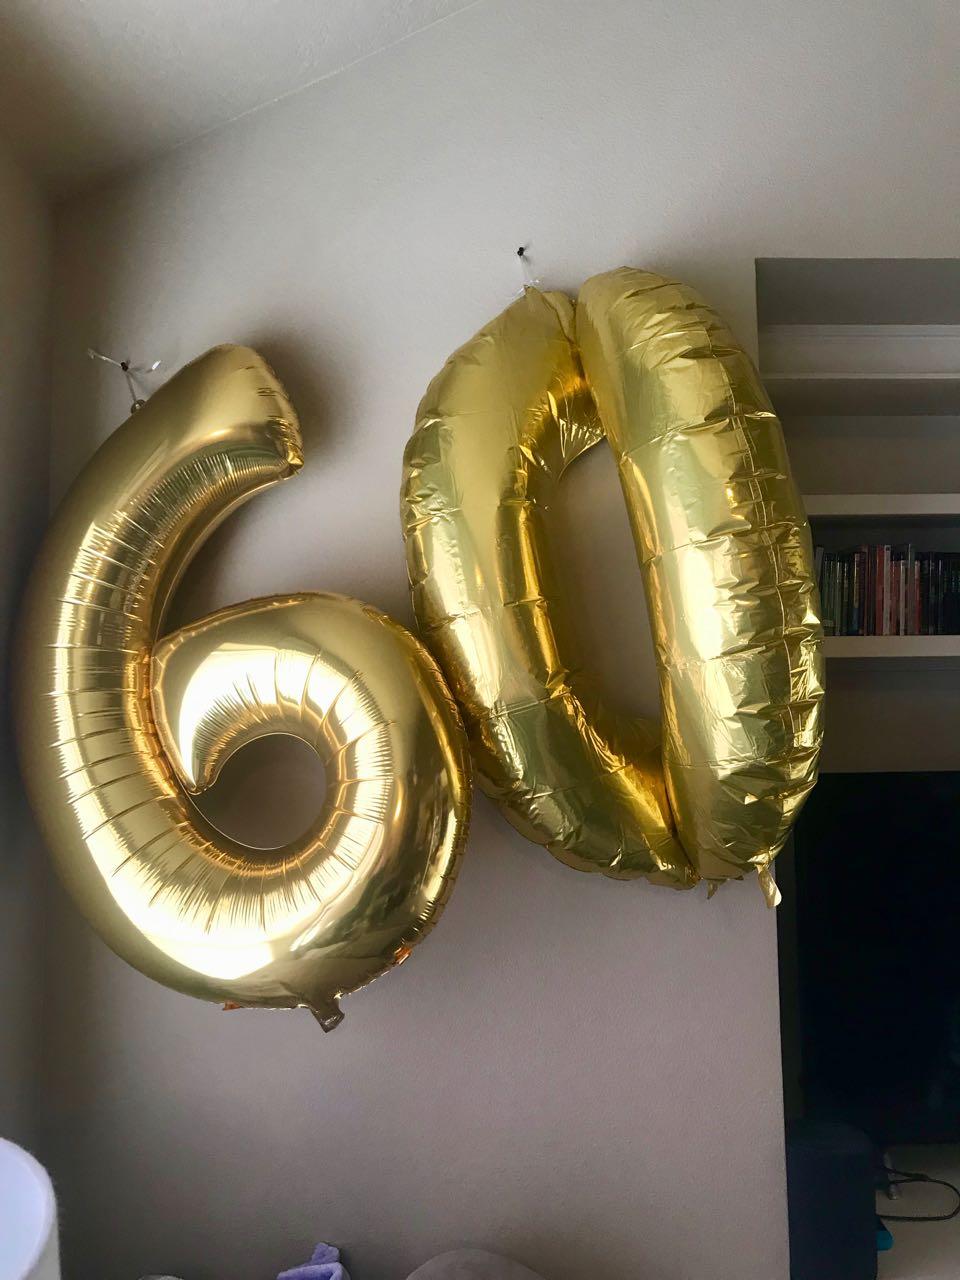 60 balloons.jpg